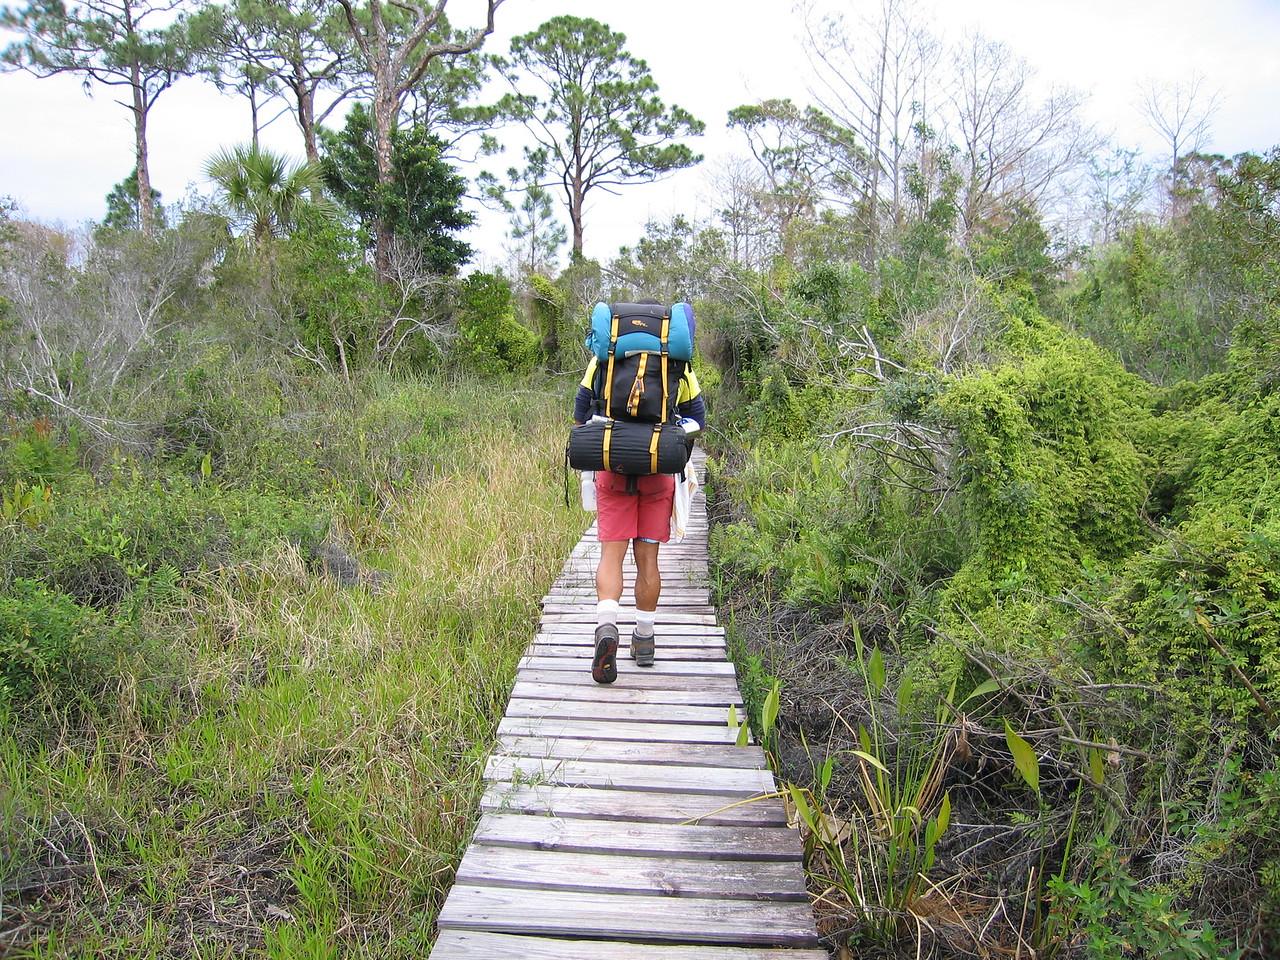 Boardwalk in JD<br /> photo credit: Raphael Clemente / Florida Trail Association